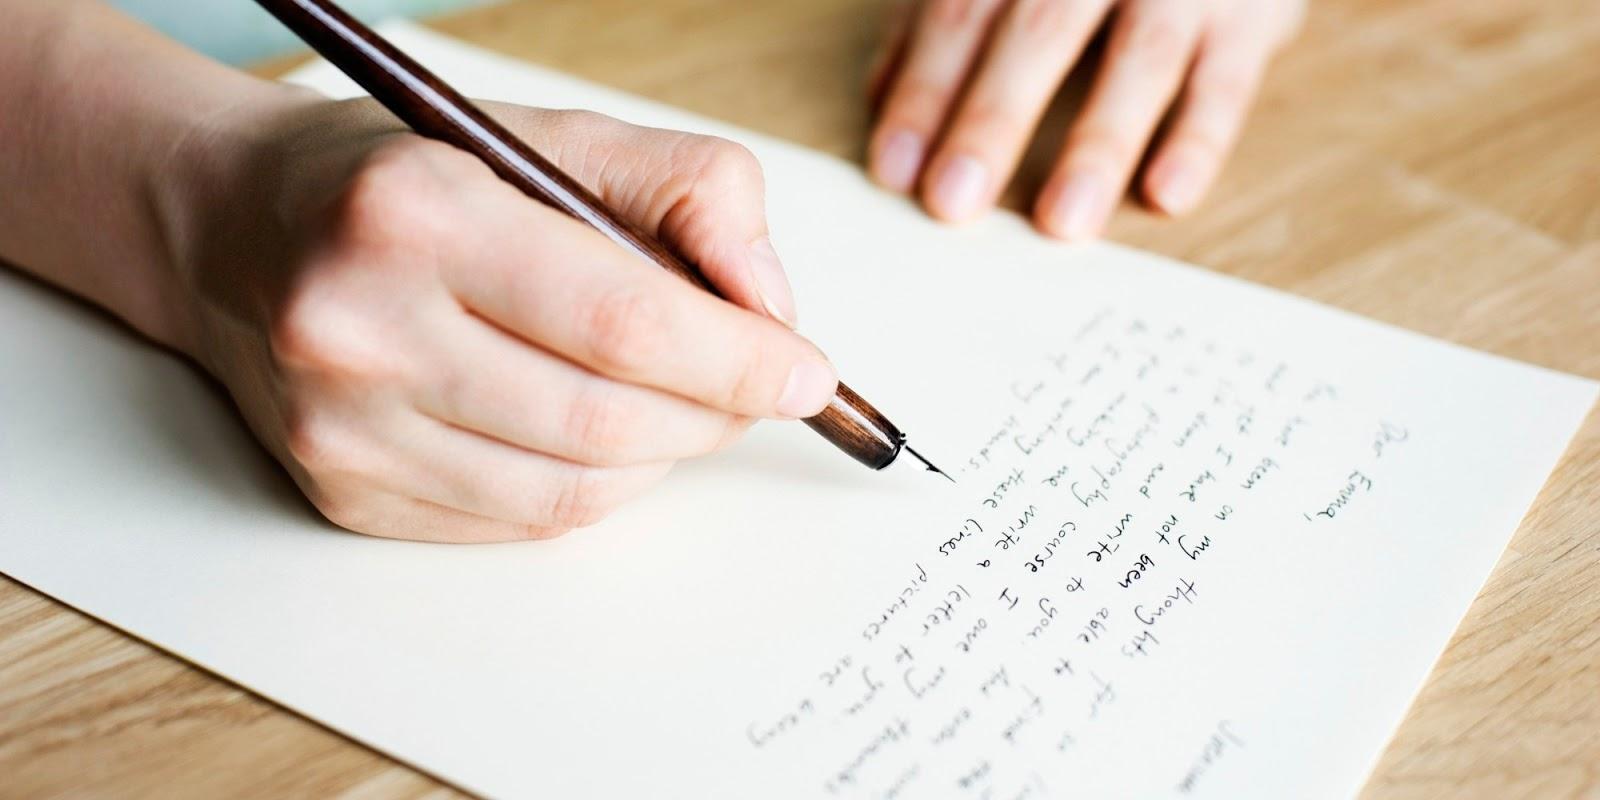 Contoh Surat Pemberitahuan Libur Lebaran Karyawan Kumpulan Proposal Dan Surat Terlengkap